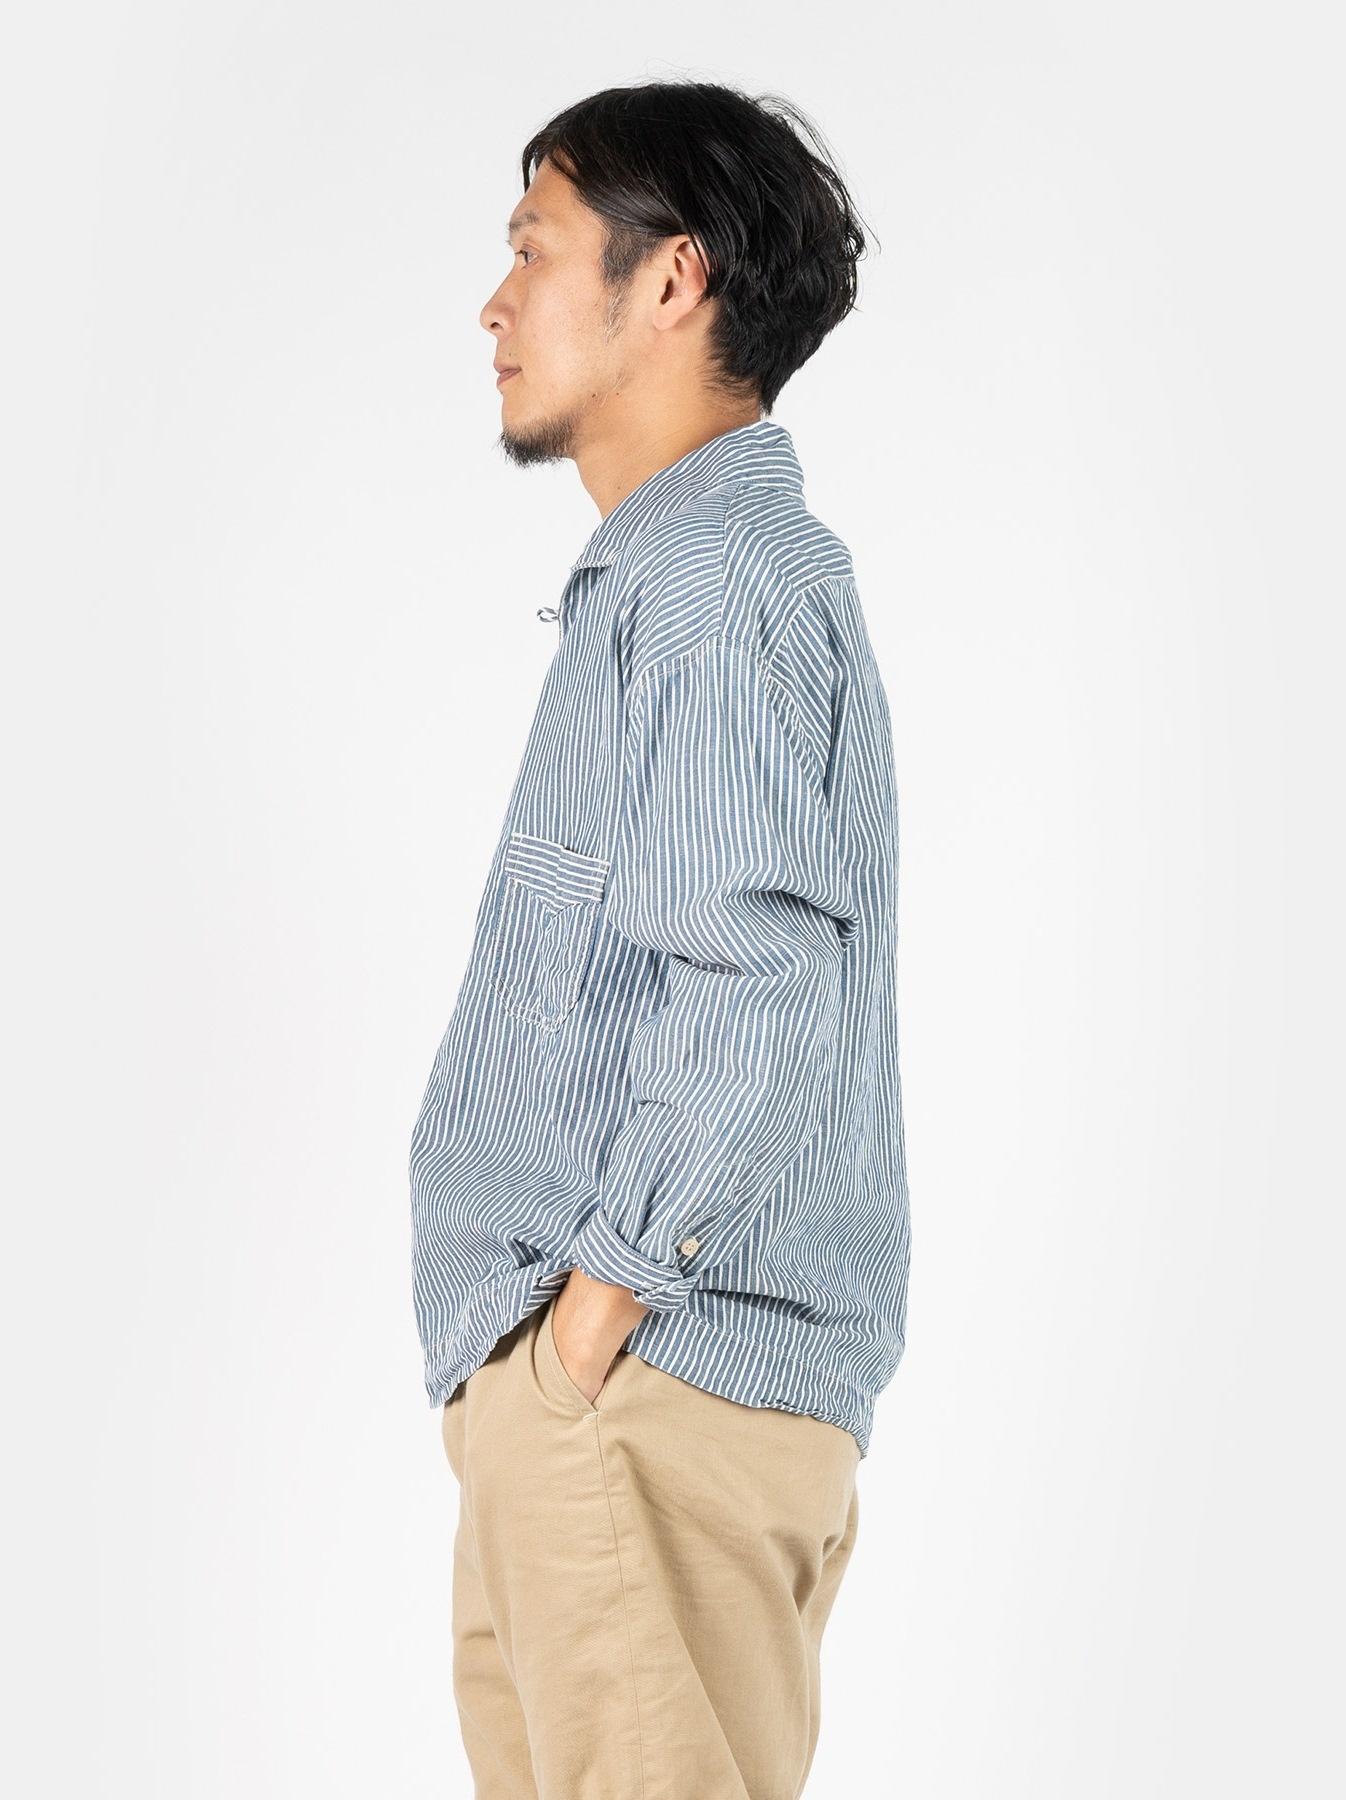 WH Cotton Linen Hickory Umahiko Pullover Shirt-4